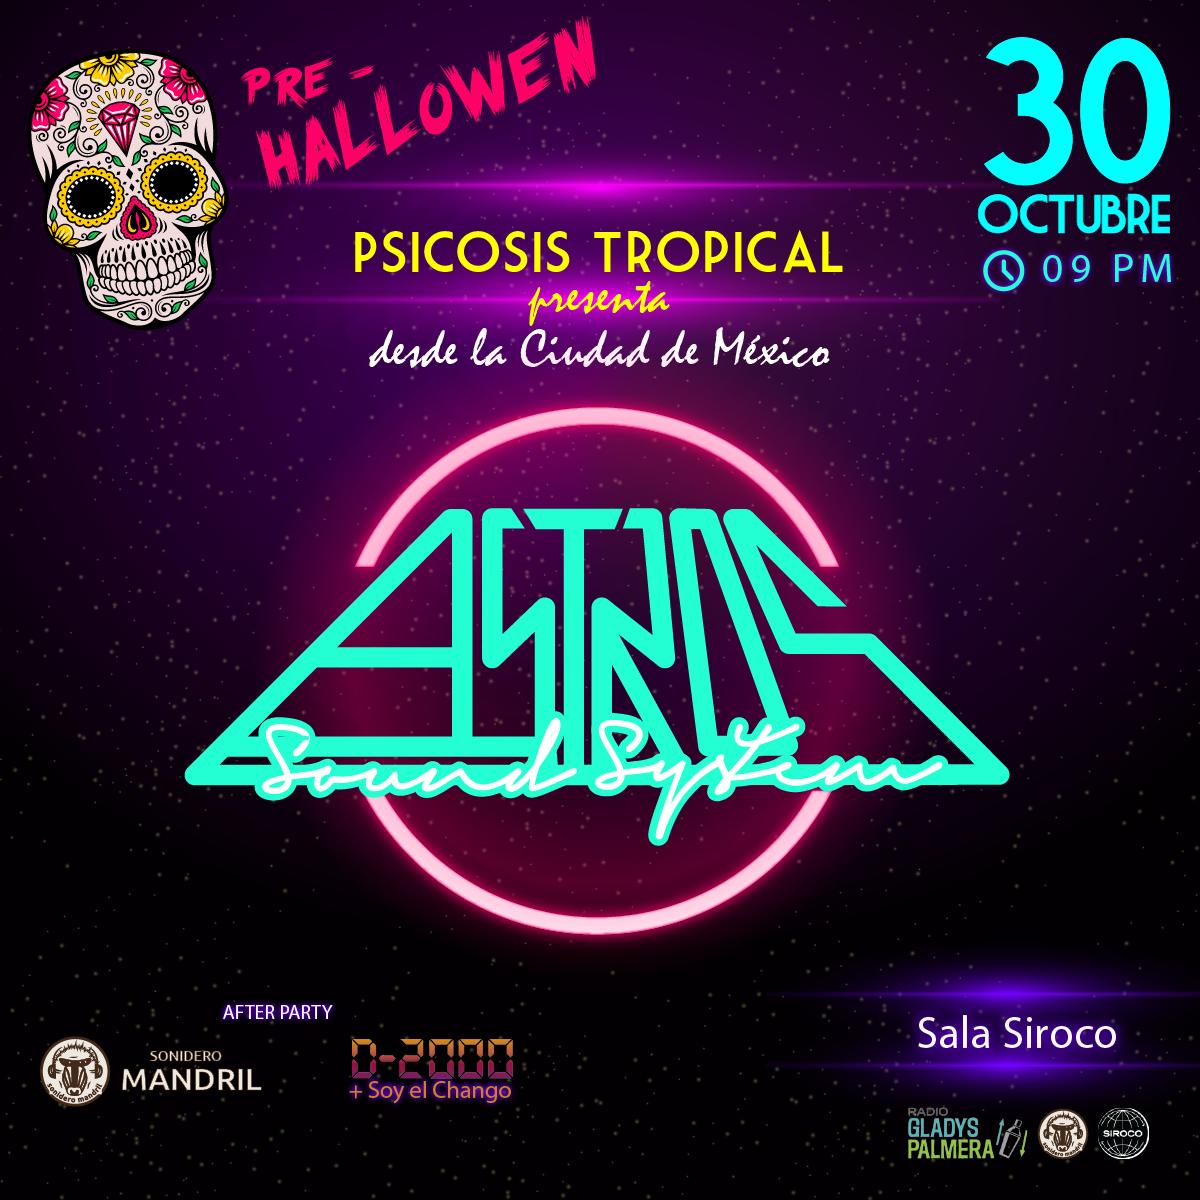 ★ Psicosis Tropical presenta: Astros Sound System